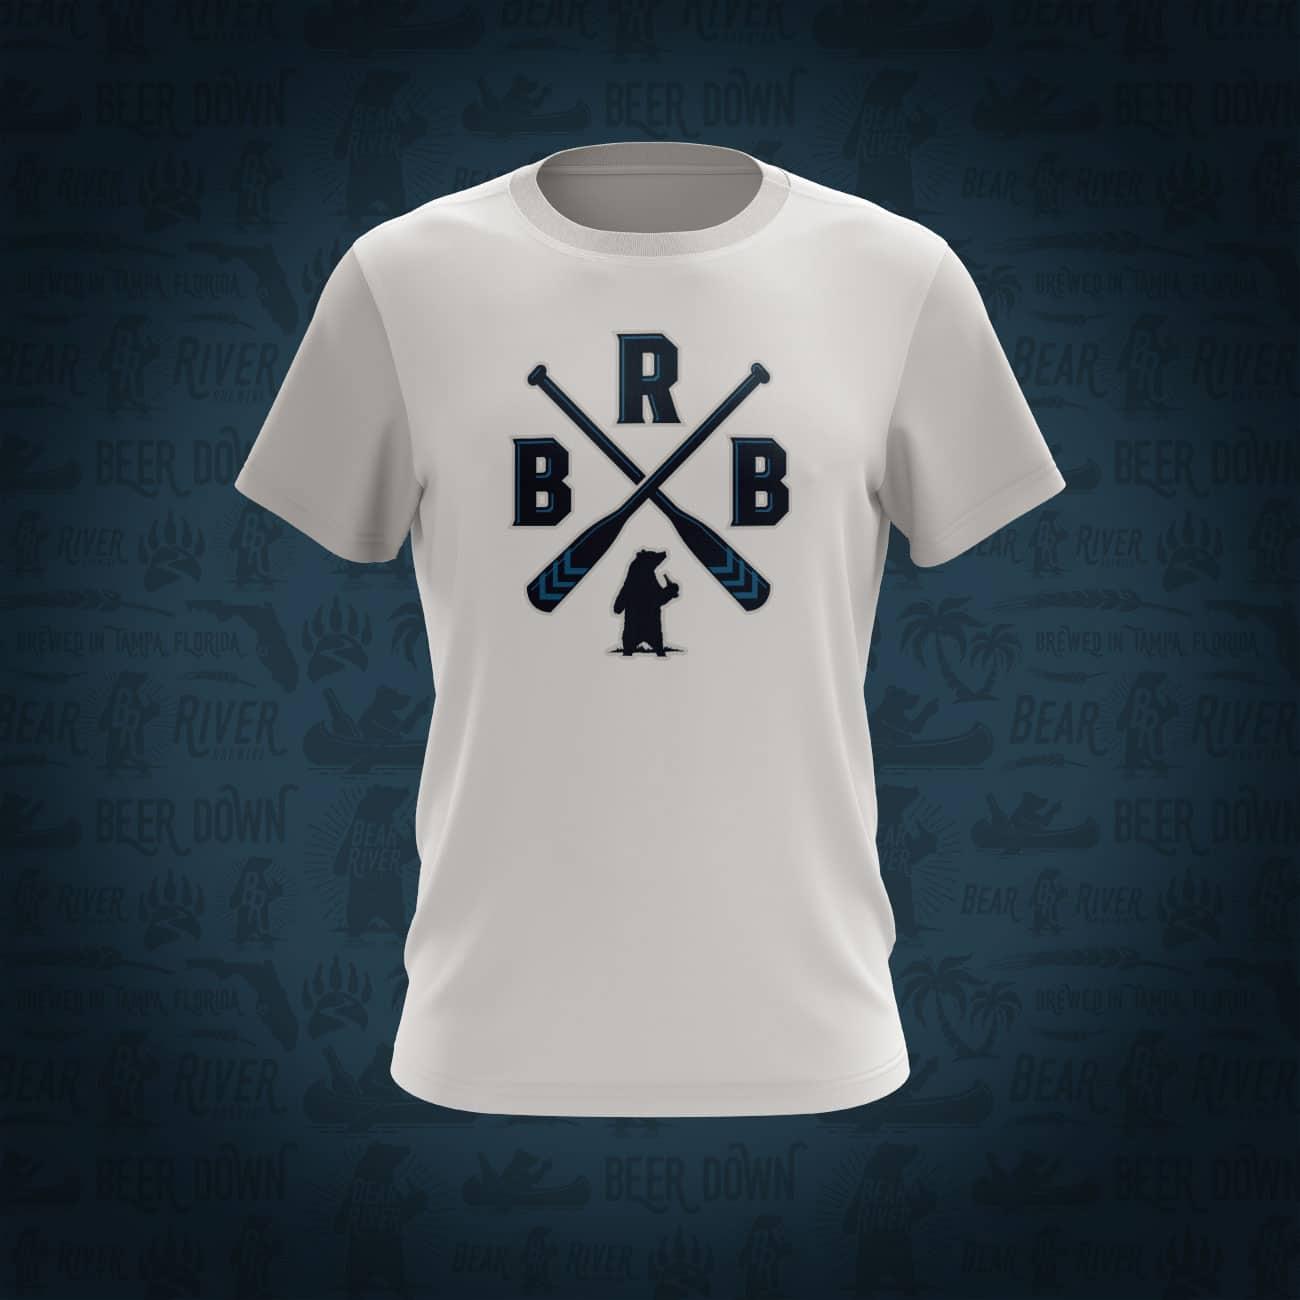 BRB Branded T-shirt